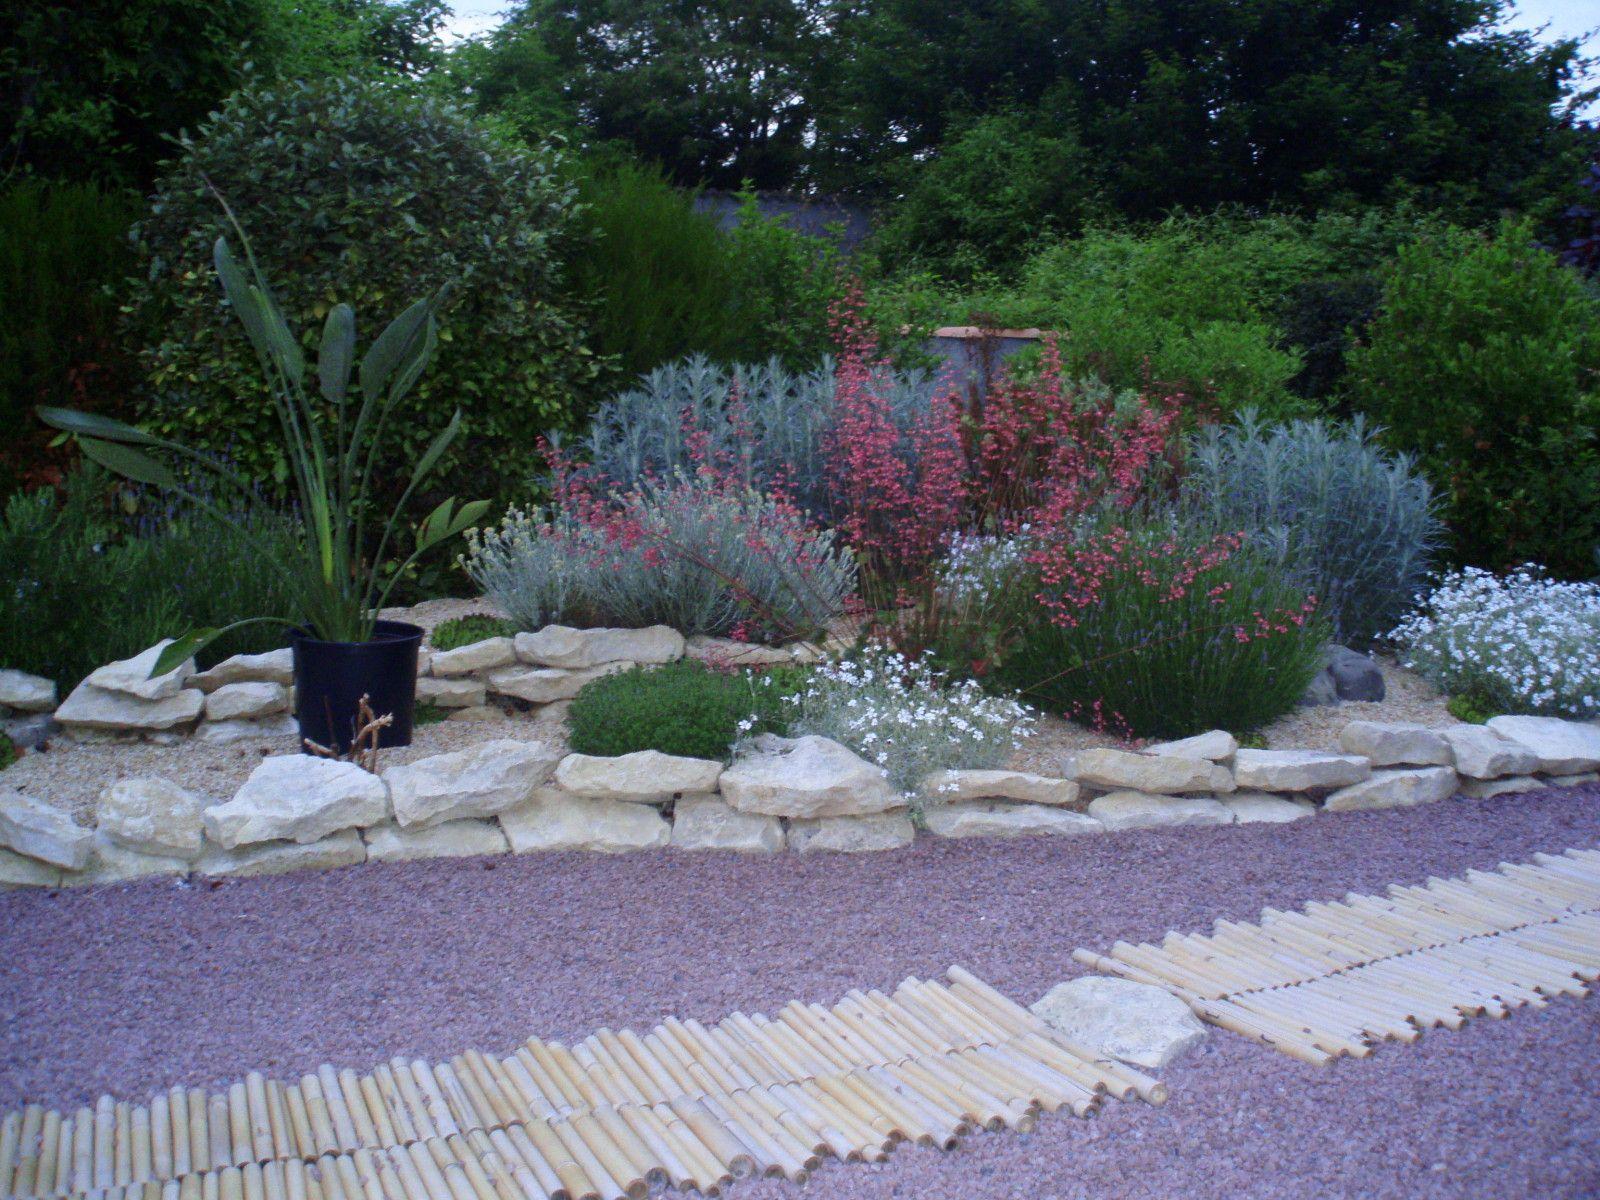 notre demeure et jardin m diterran en le blog de soficat jardin pinterest jardin. Black Bedroom Furniture Sets. Home Design Ideas